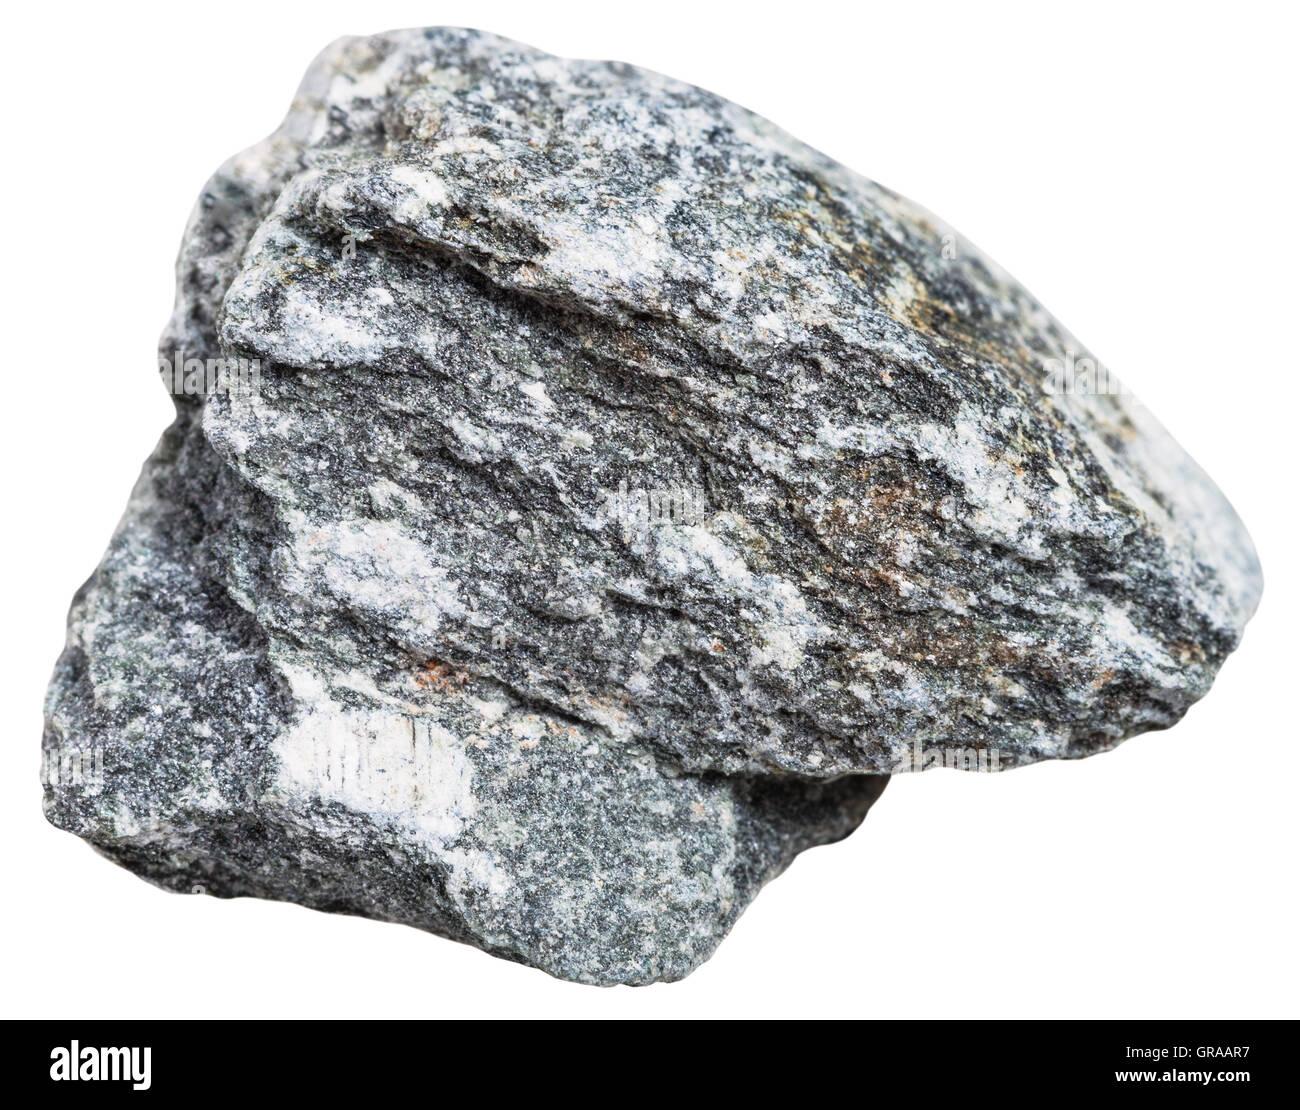 White Metamorphic Rock : Macro shooting of metamorphic rock specimens natural